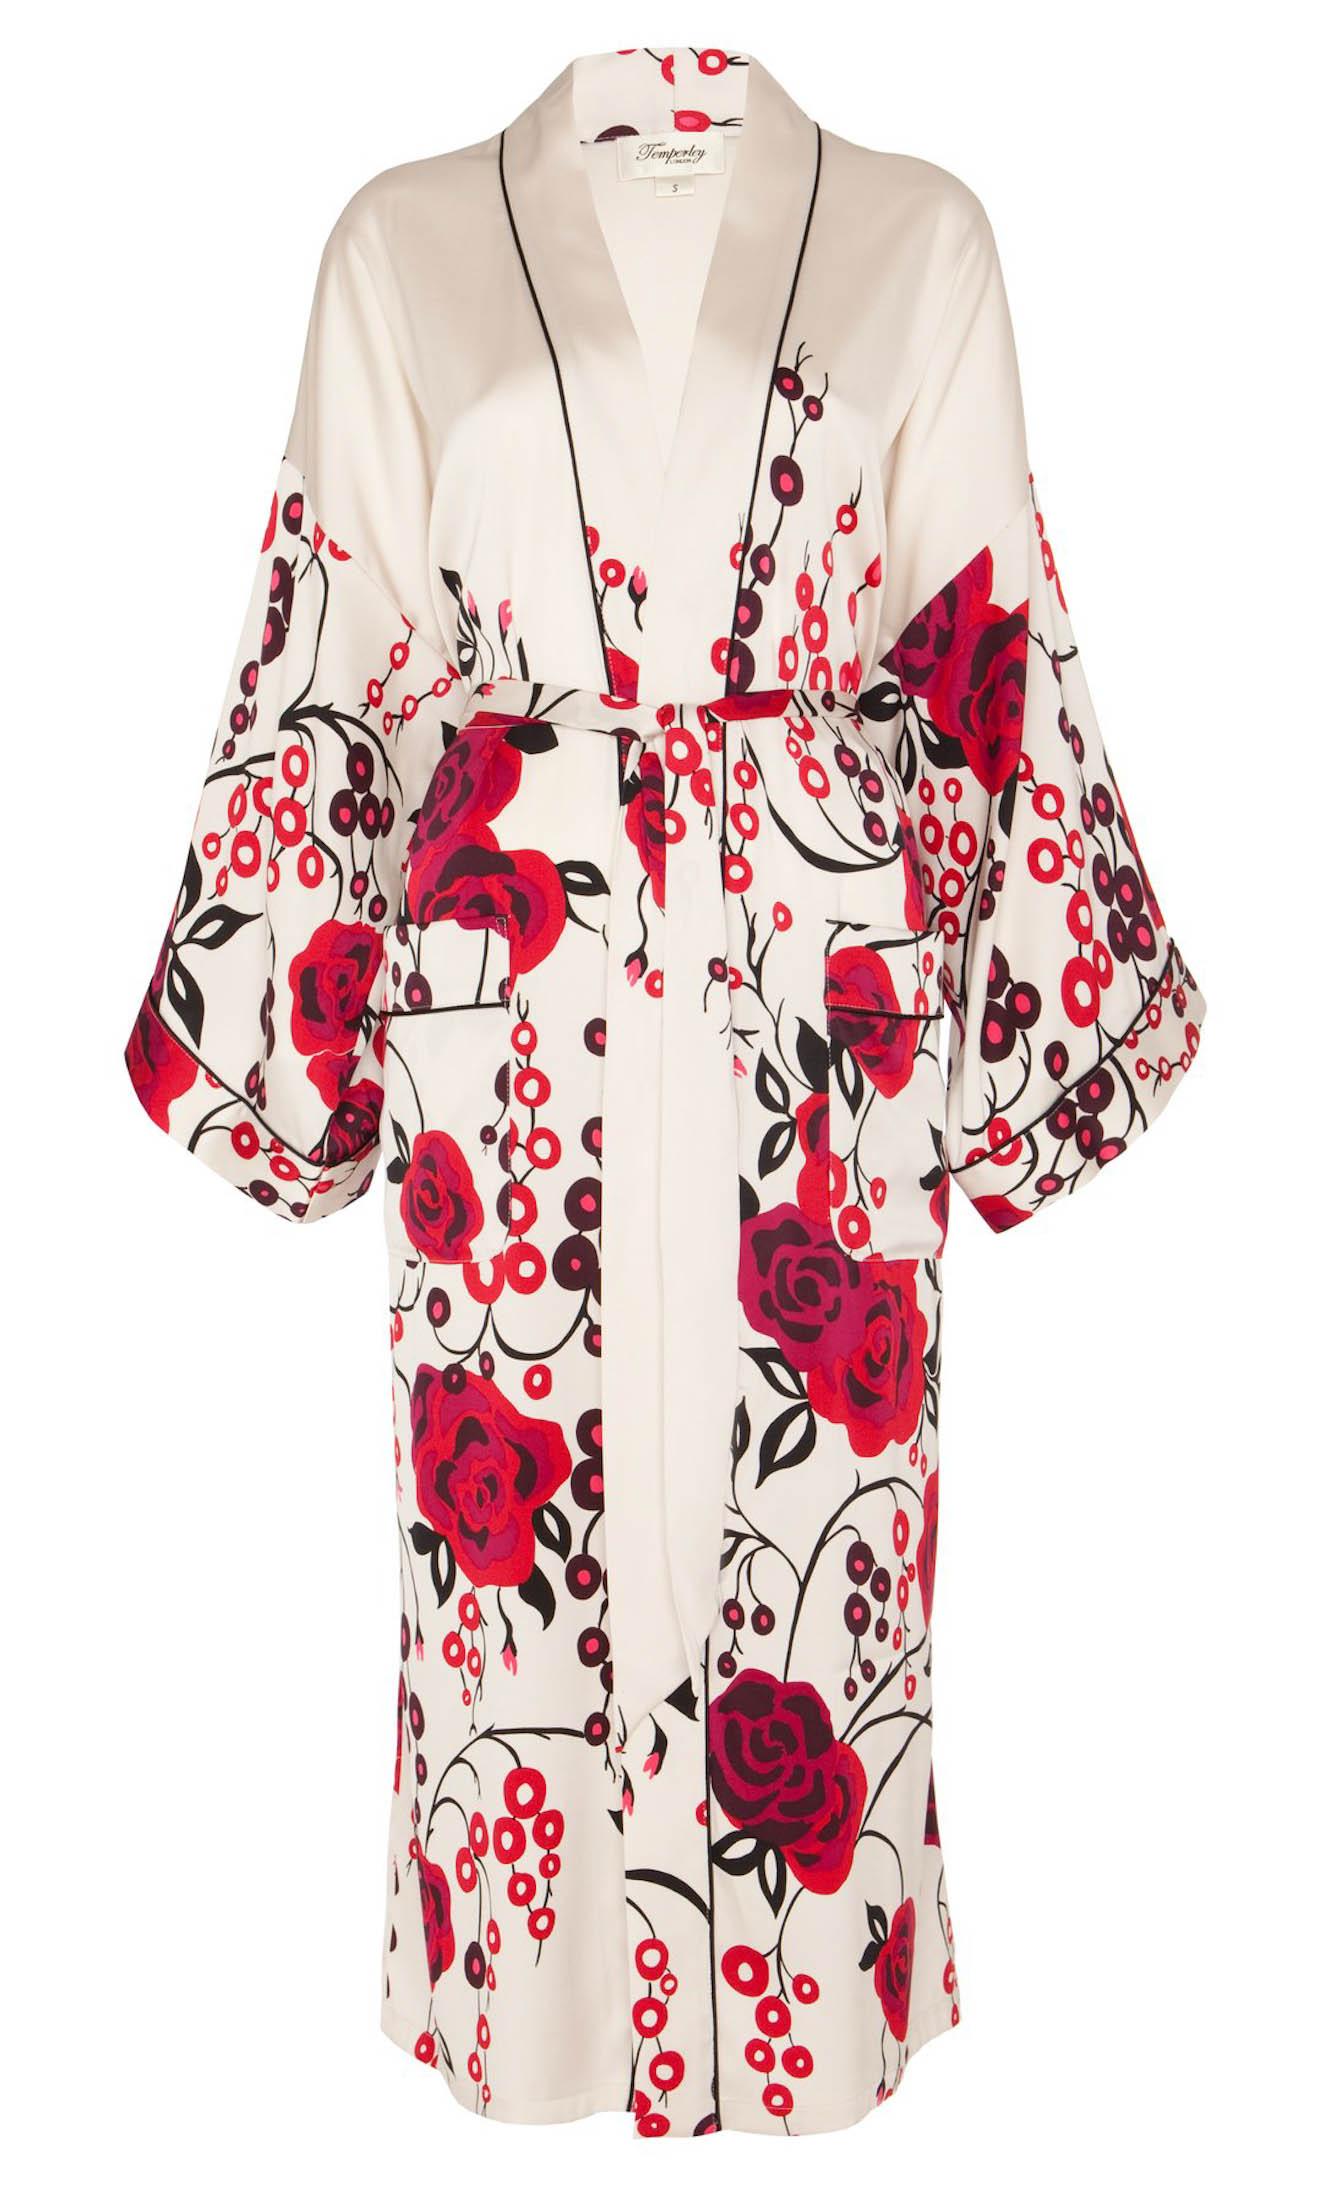 Lyst - Temperley London Kimono Dressing Gown in Black